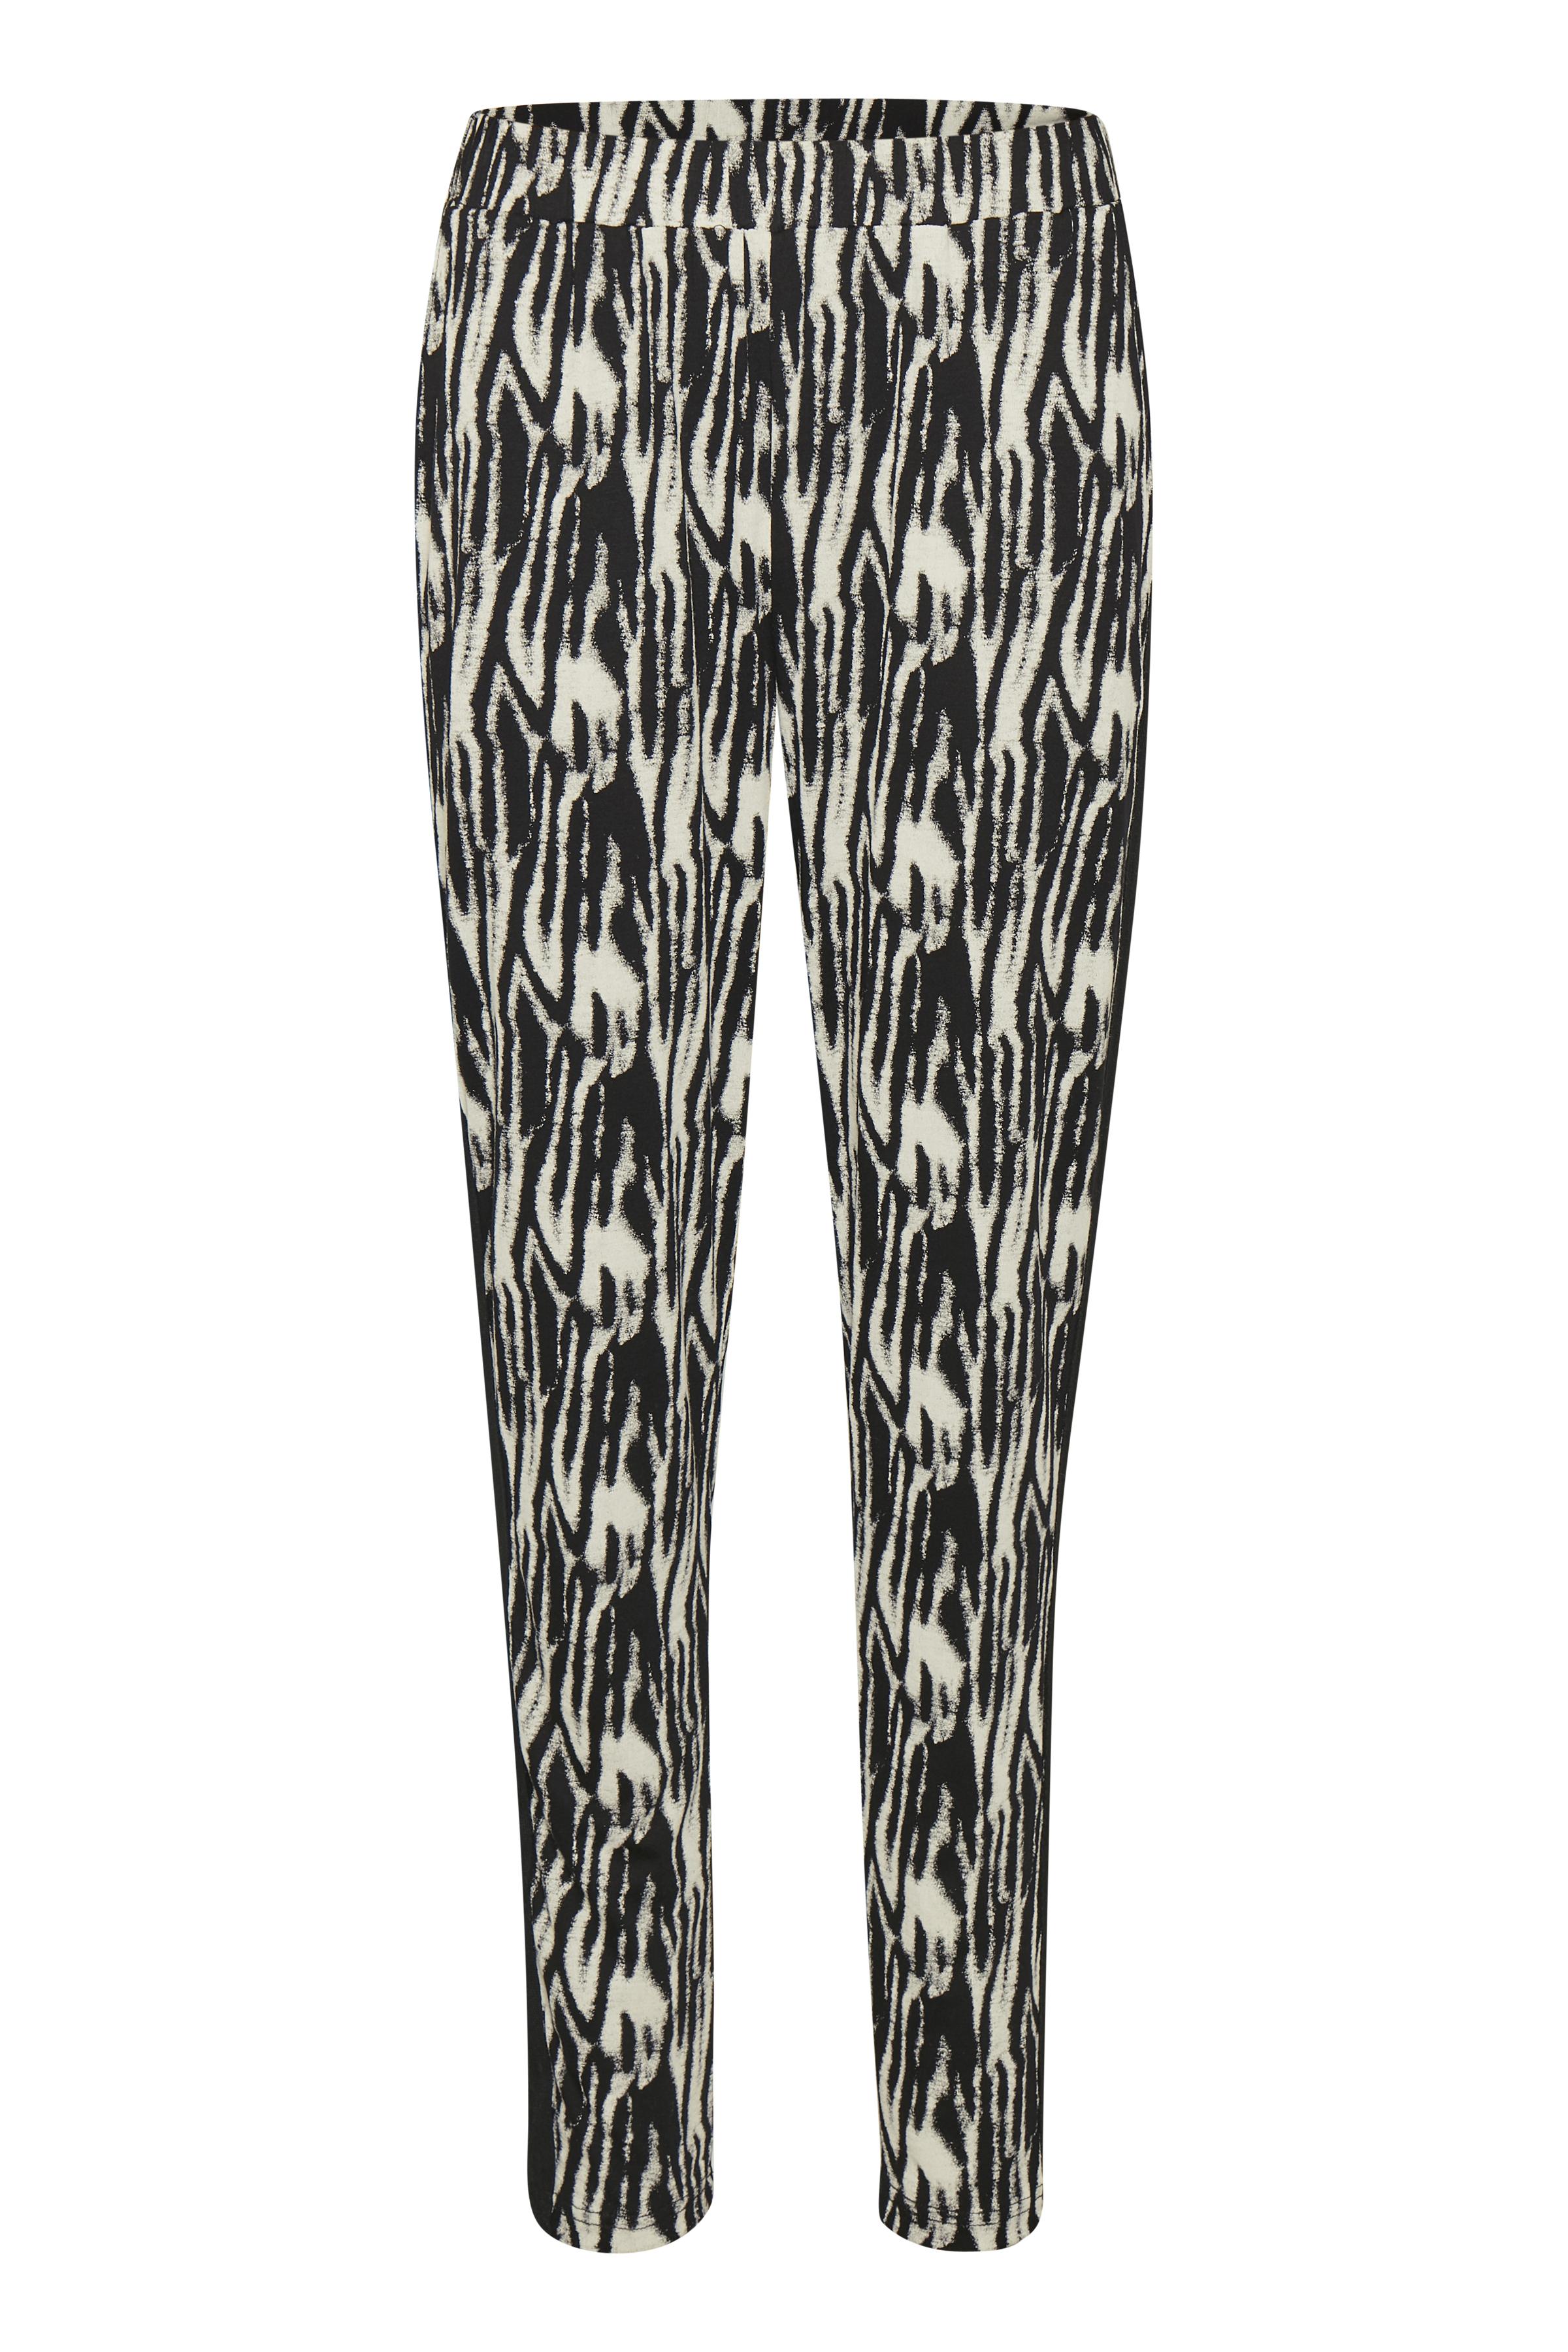 Image of BonA Parte Dame Jerseybuks med elastik i taljen. Sidelommer. Printet jerseykvalitet. Bukserne - Sort/grå